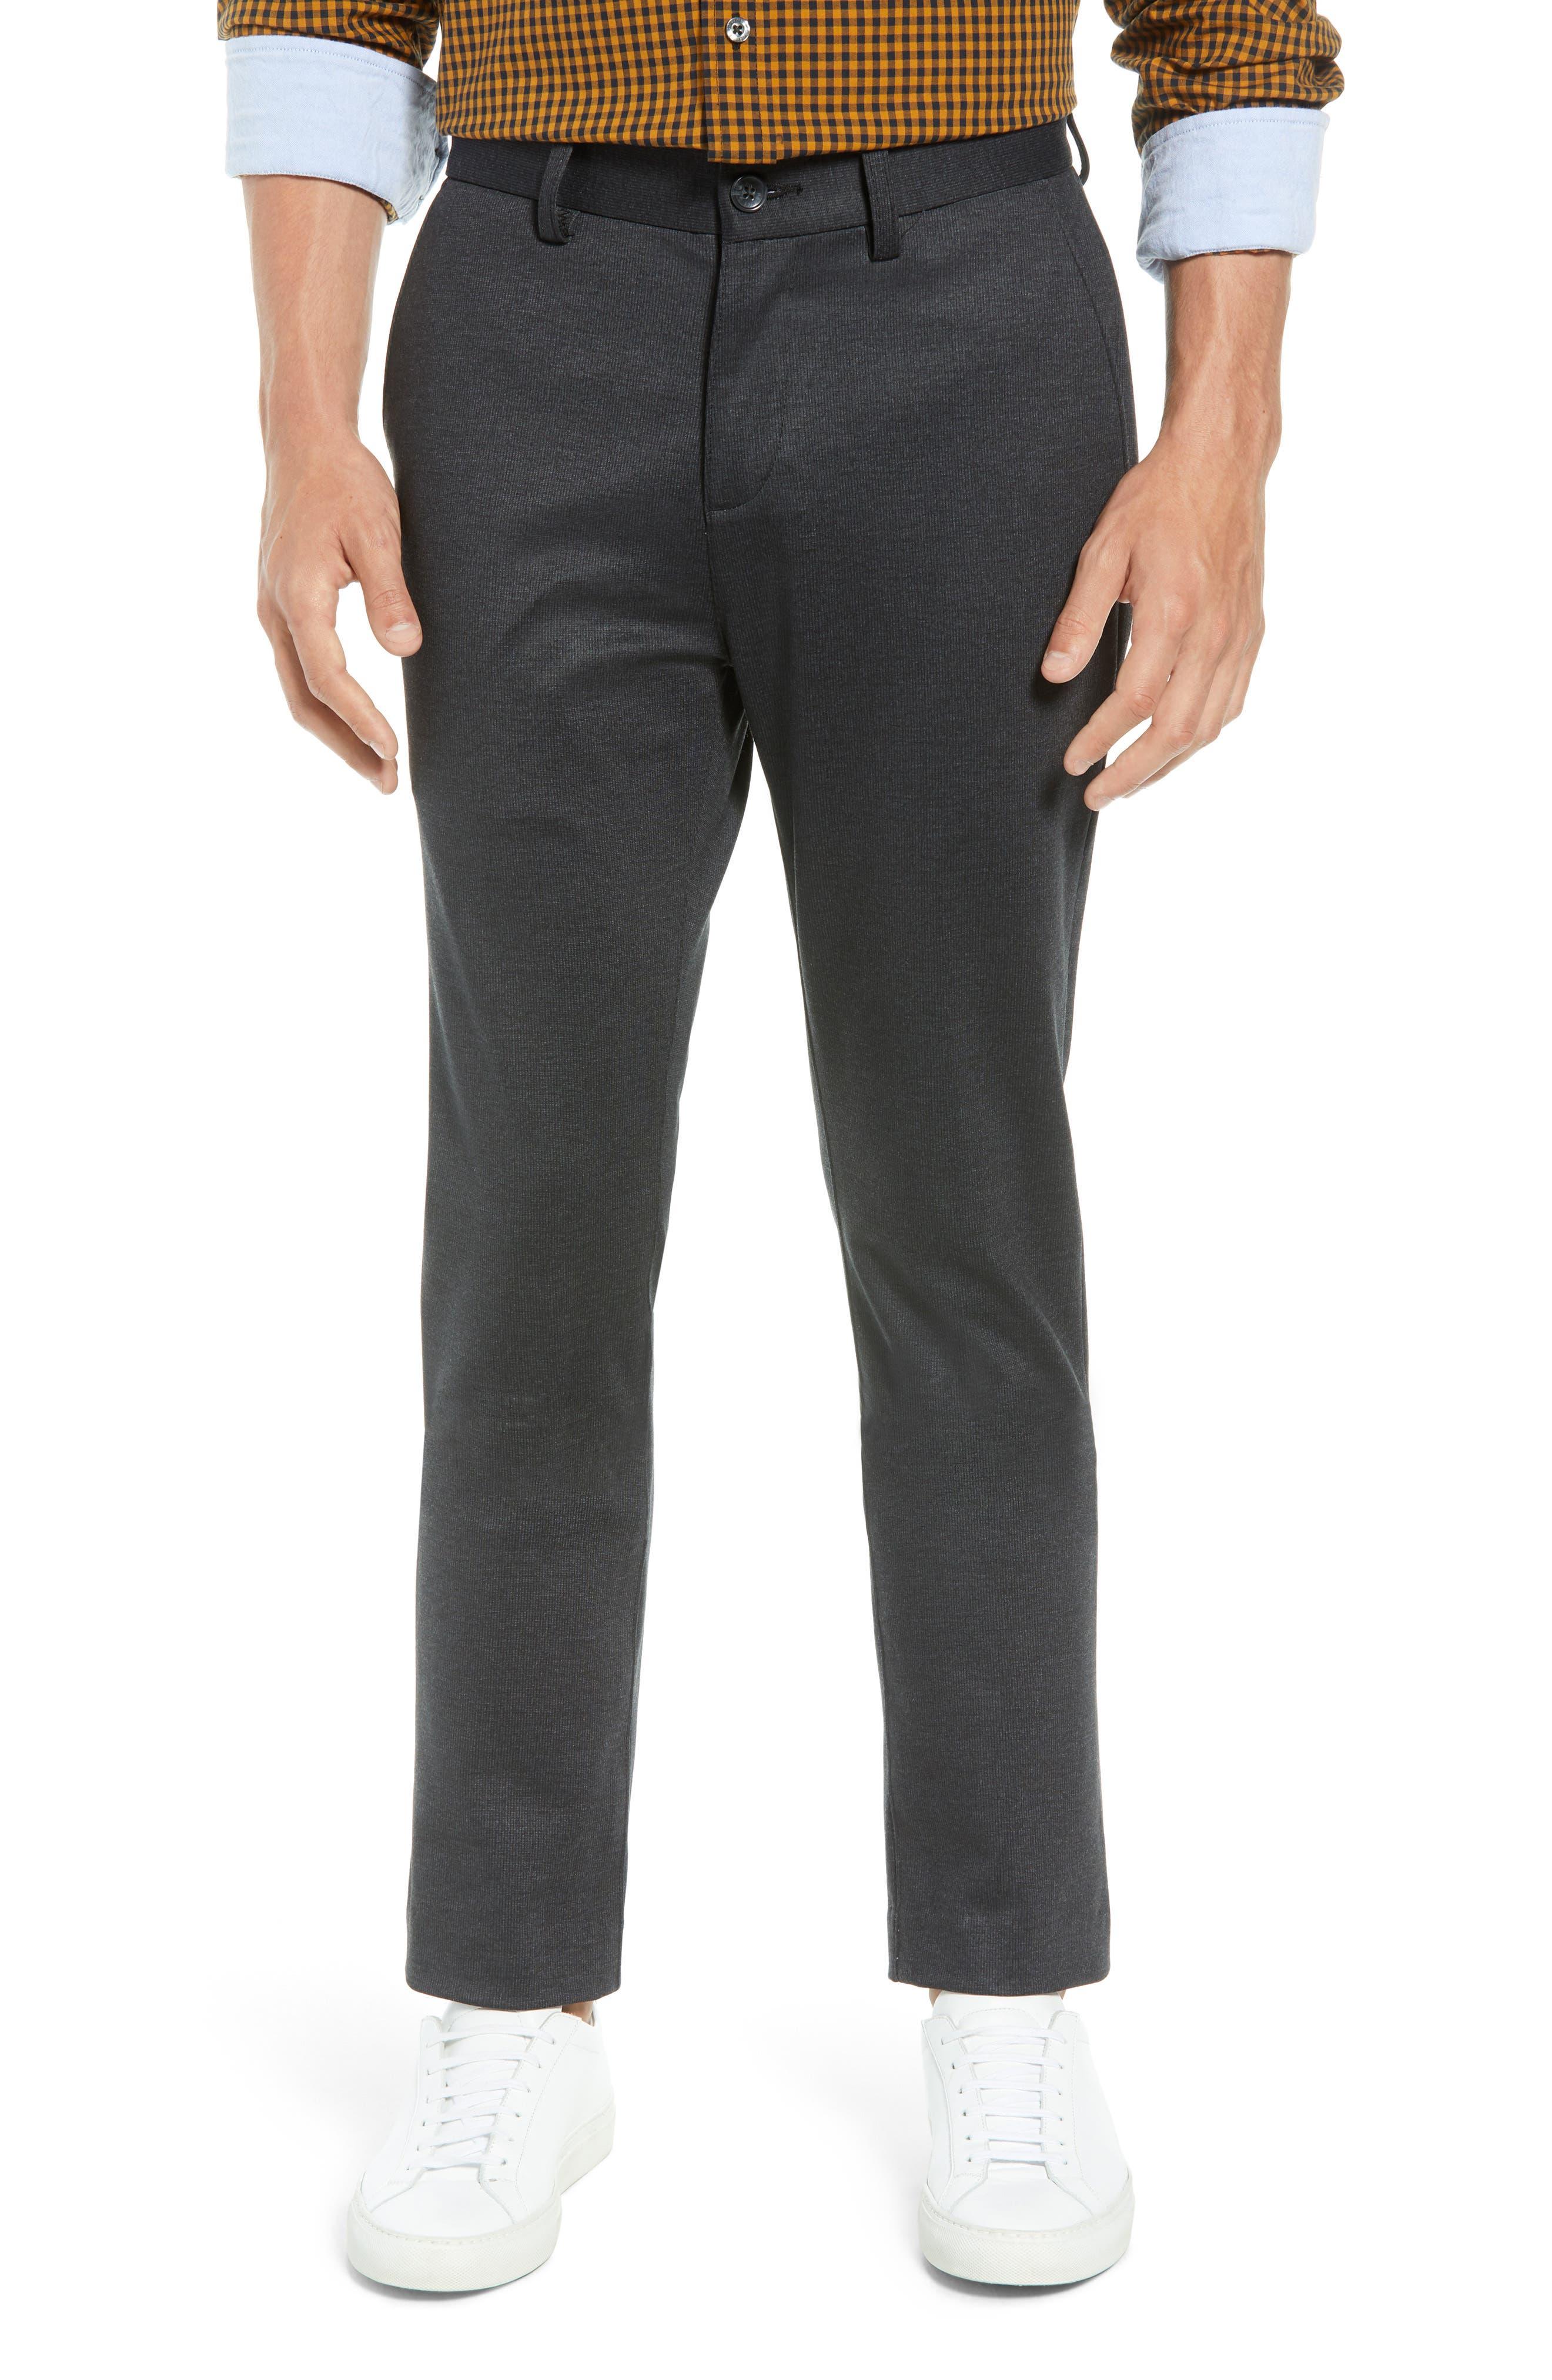 Slim Fit Ponte Knit Trousers,                         Main,                         color, 020